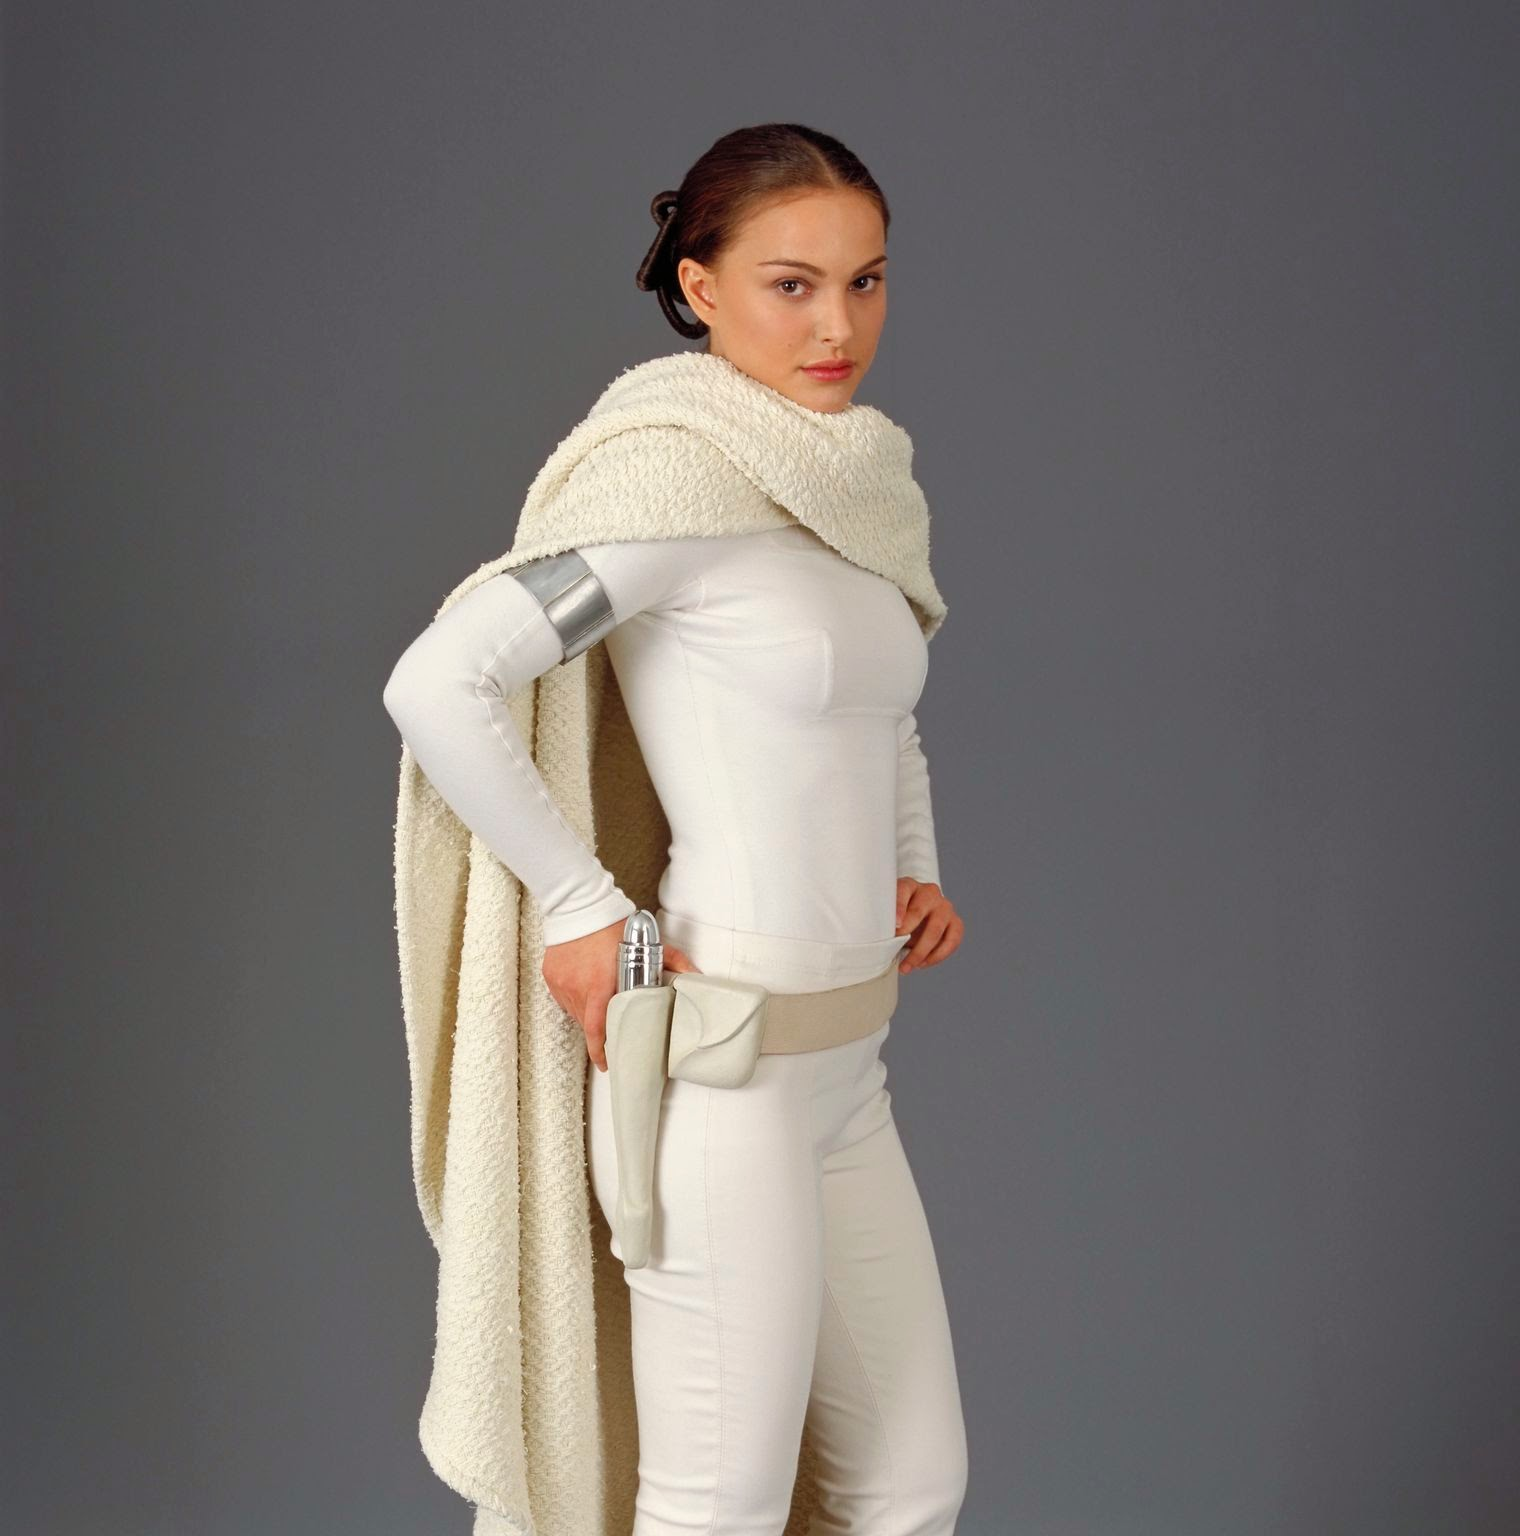 One With The Force: Padmé Amidala